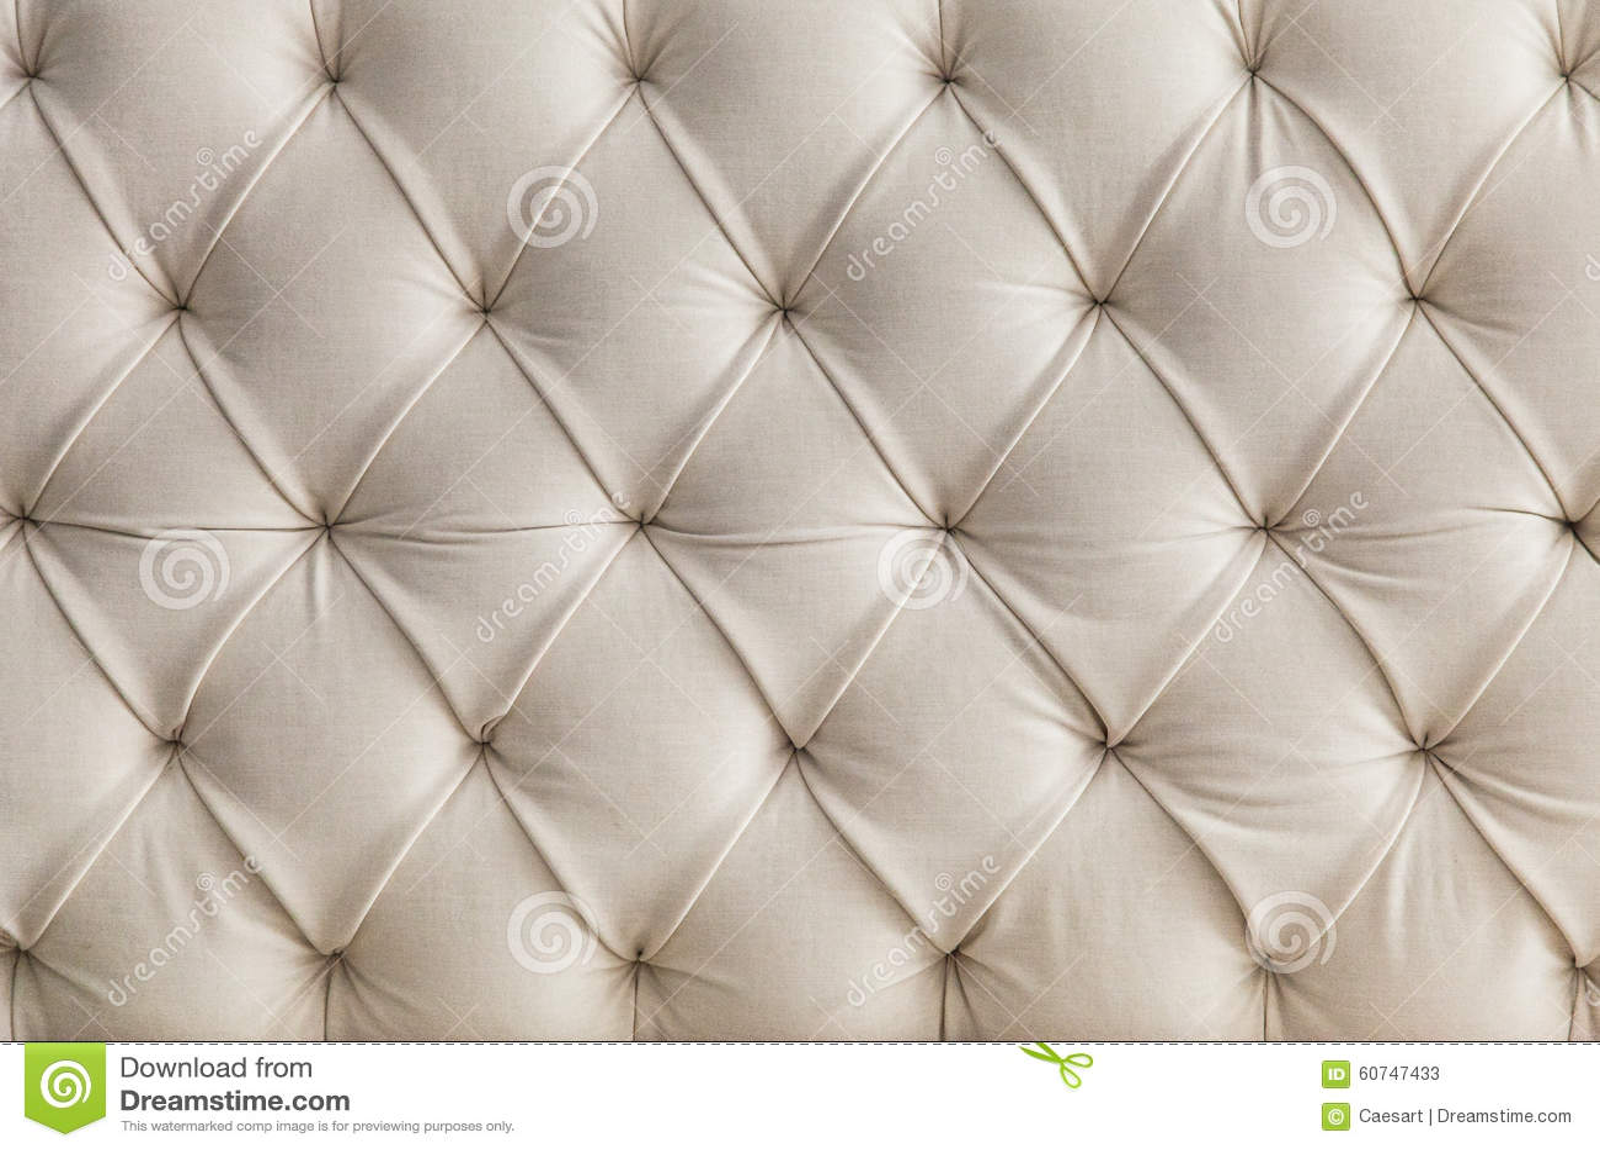 Light Upholstery White Sofa Texture Pattern Background